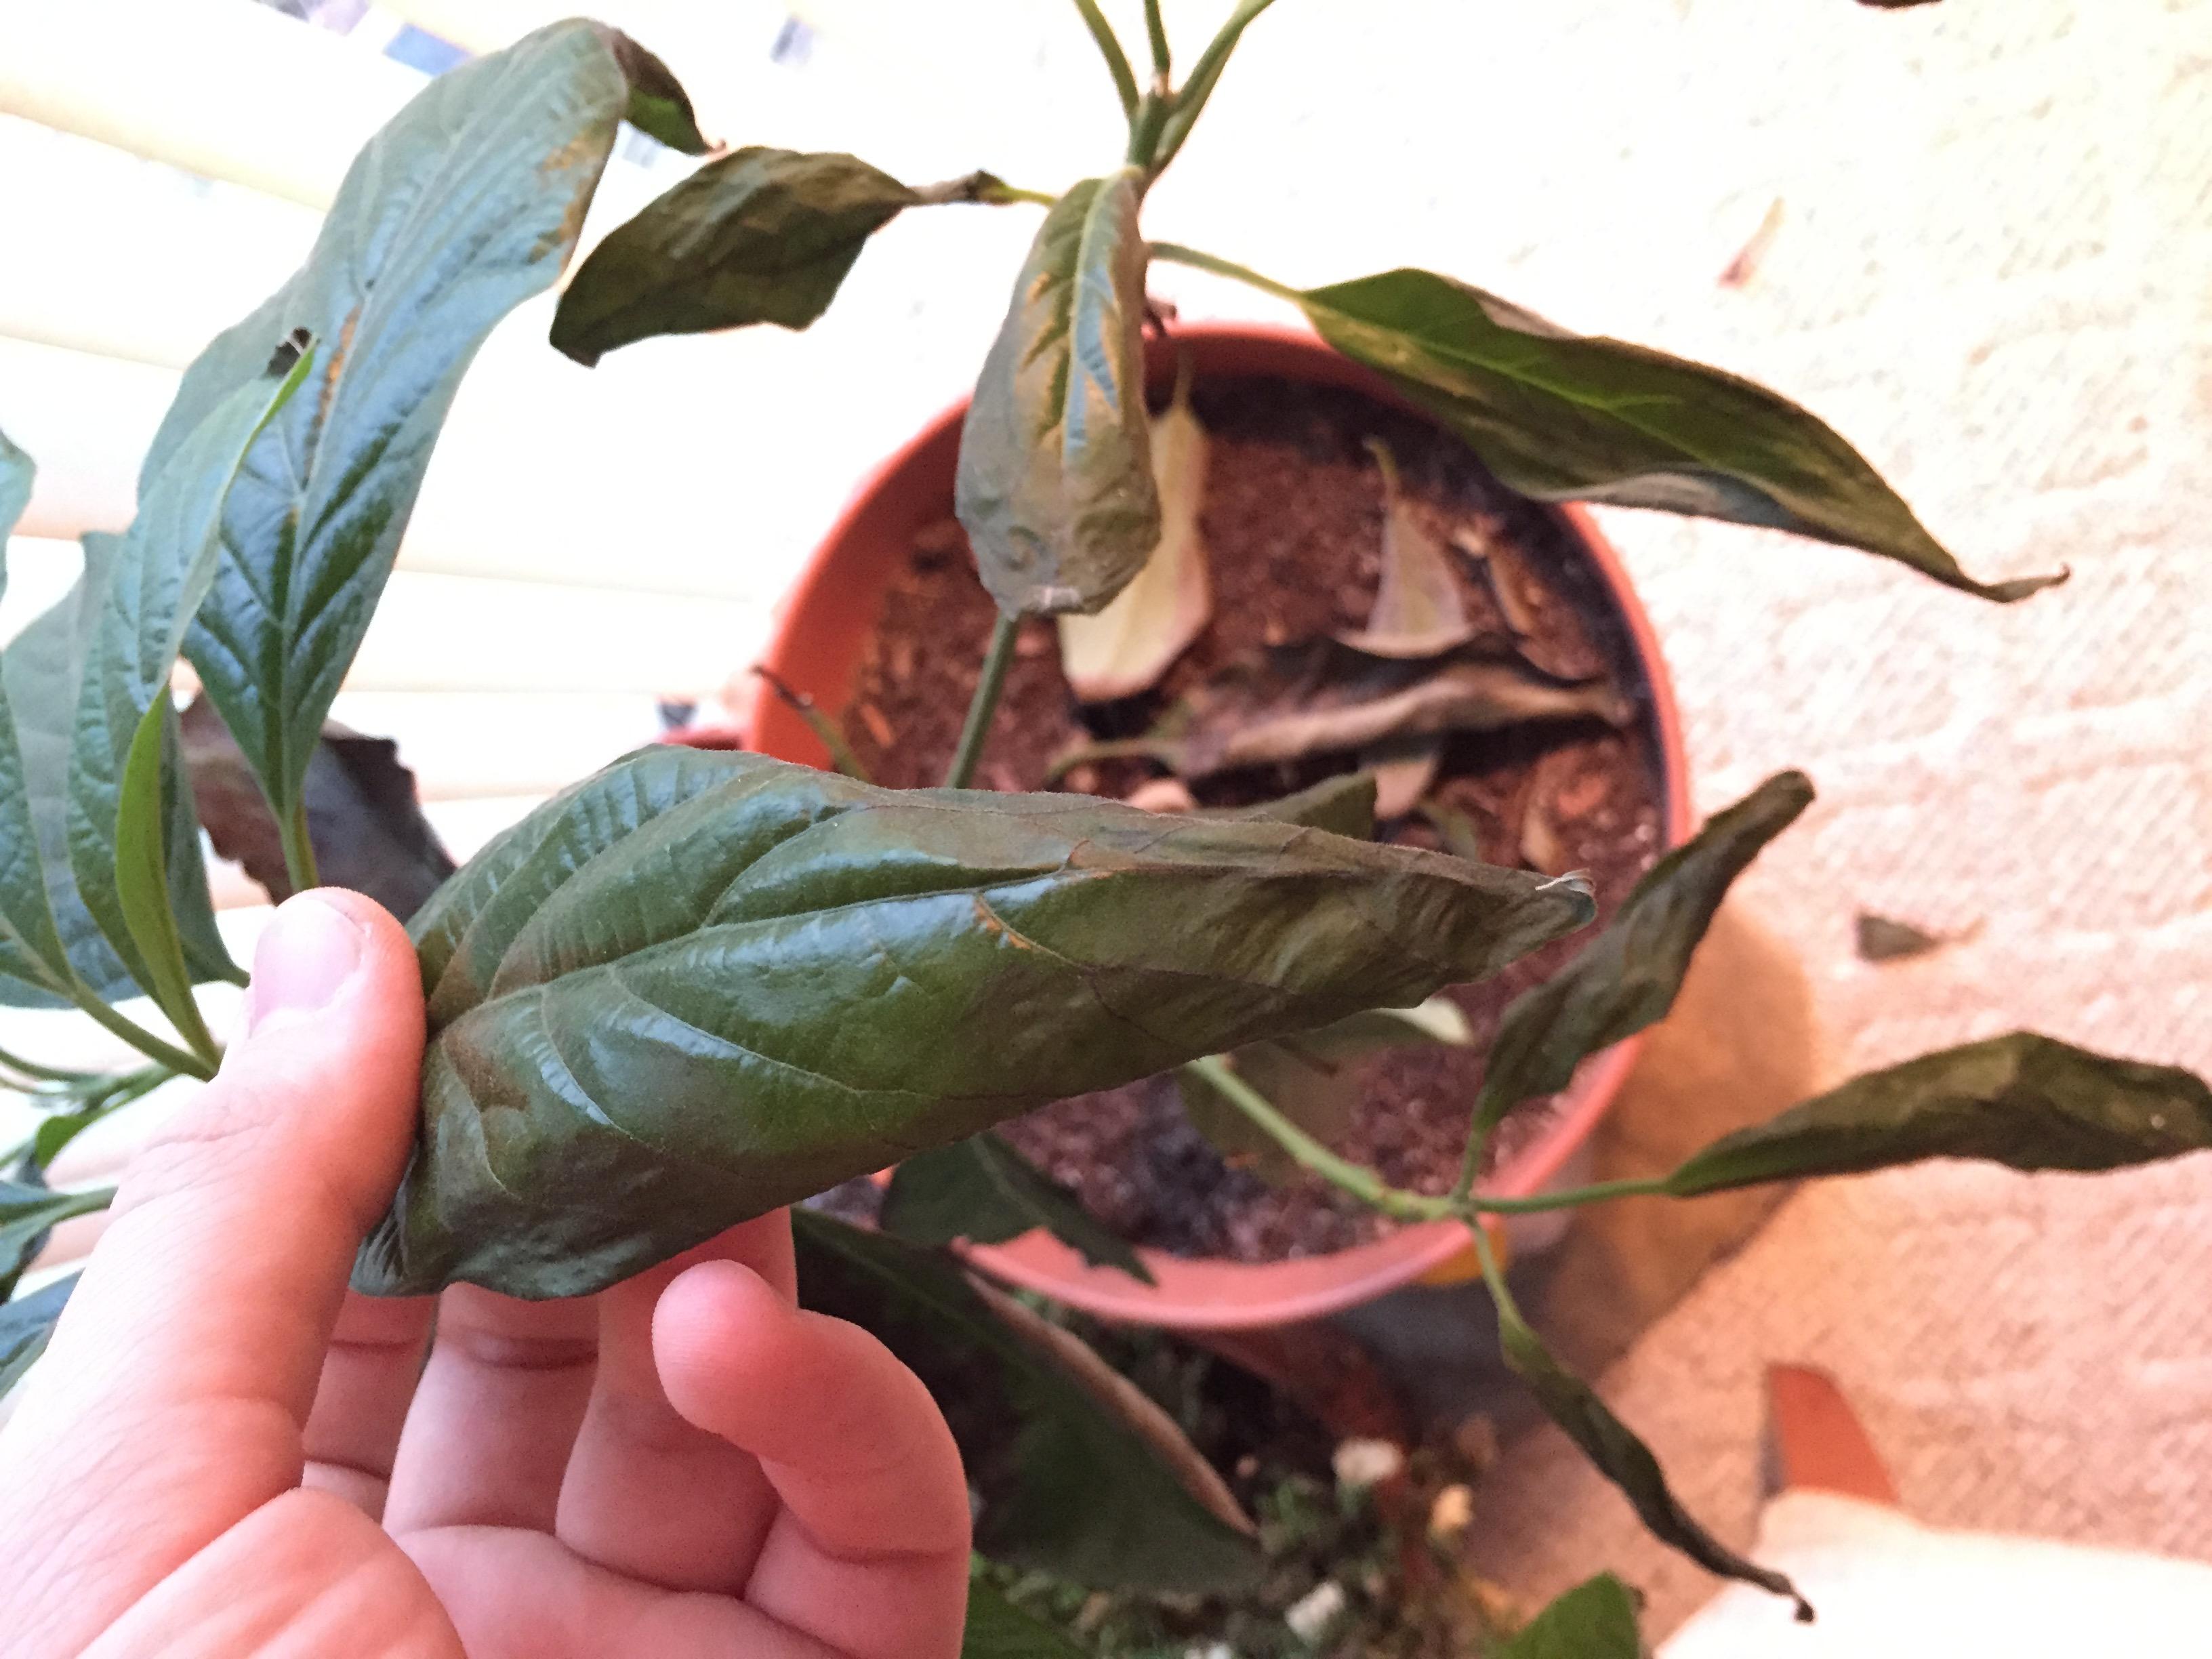 Avocado Leaves Curling Up Helpfulgardenercom Gardening Forum